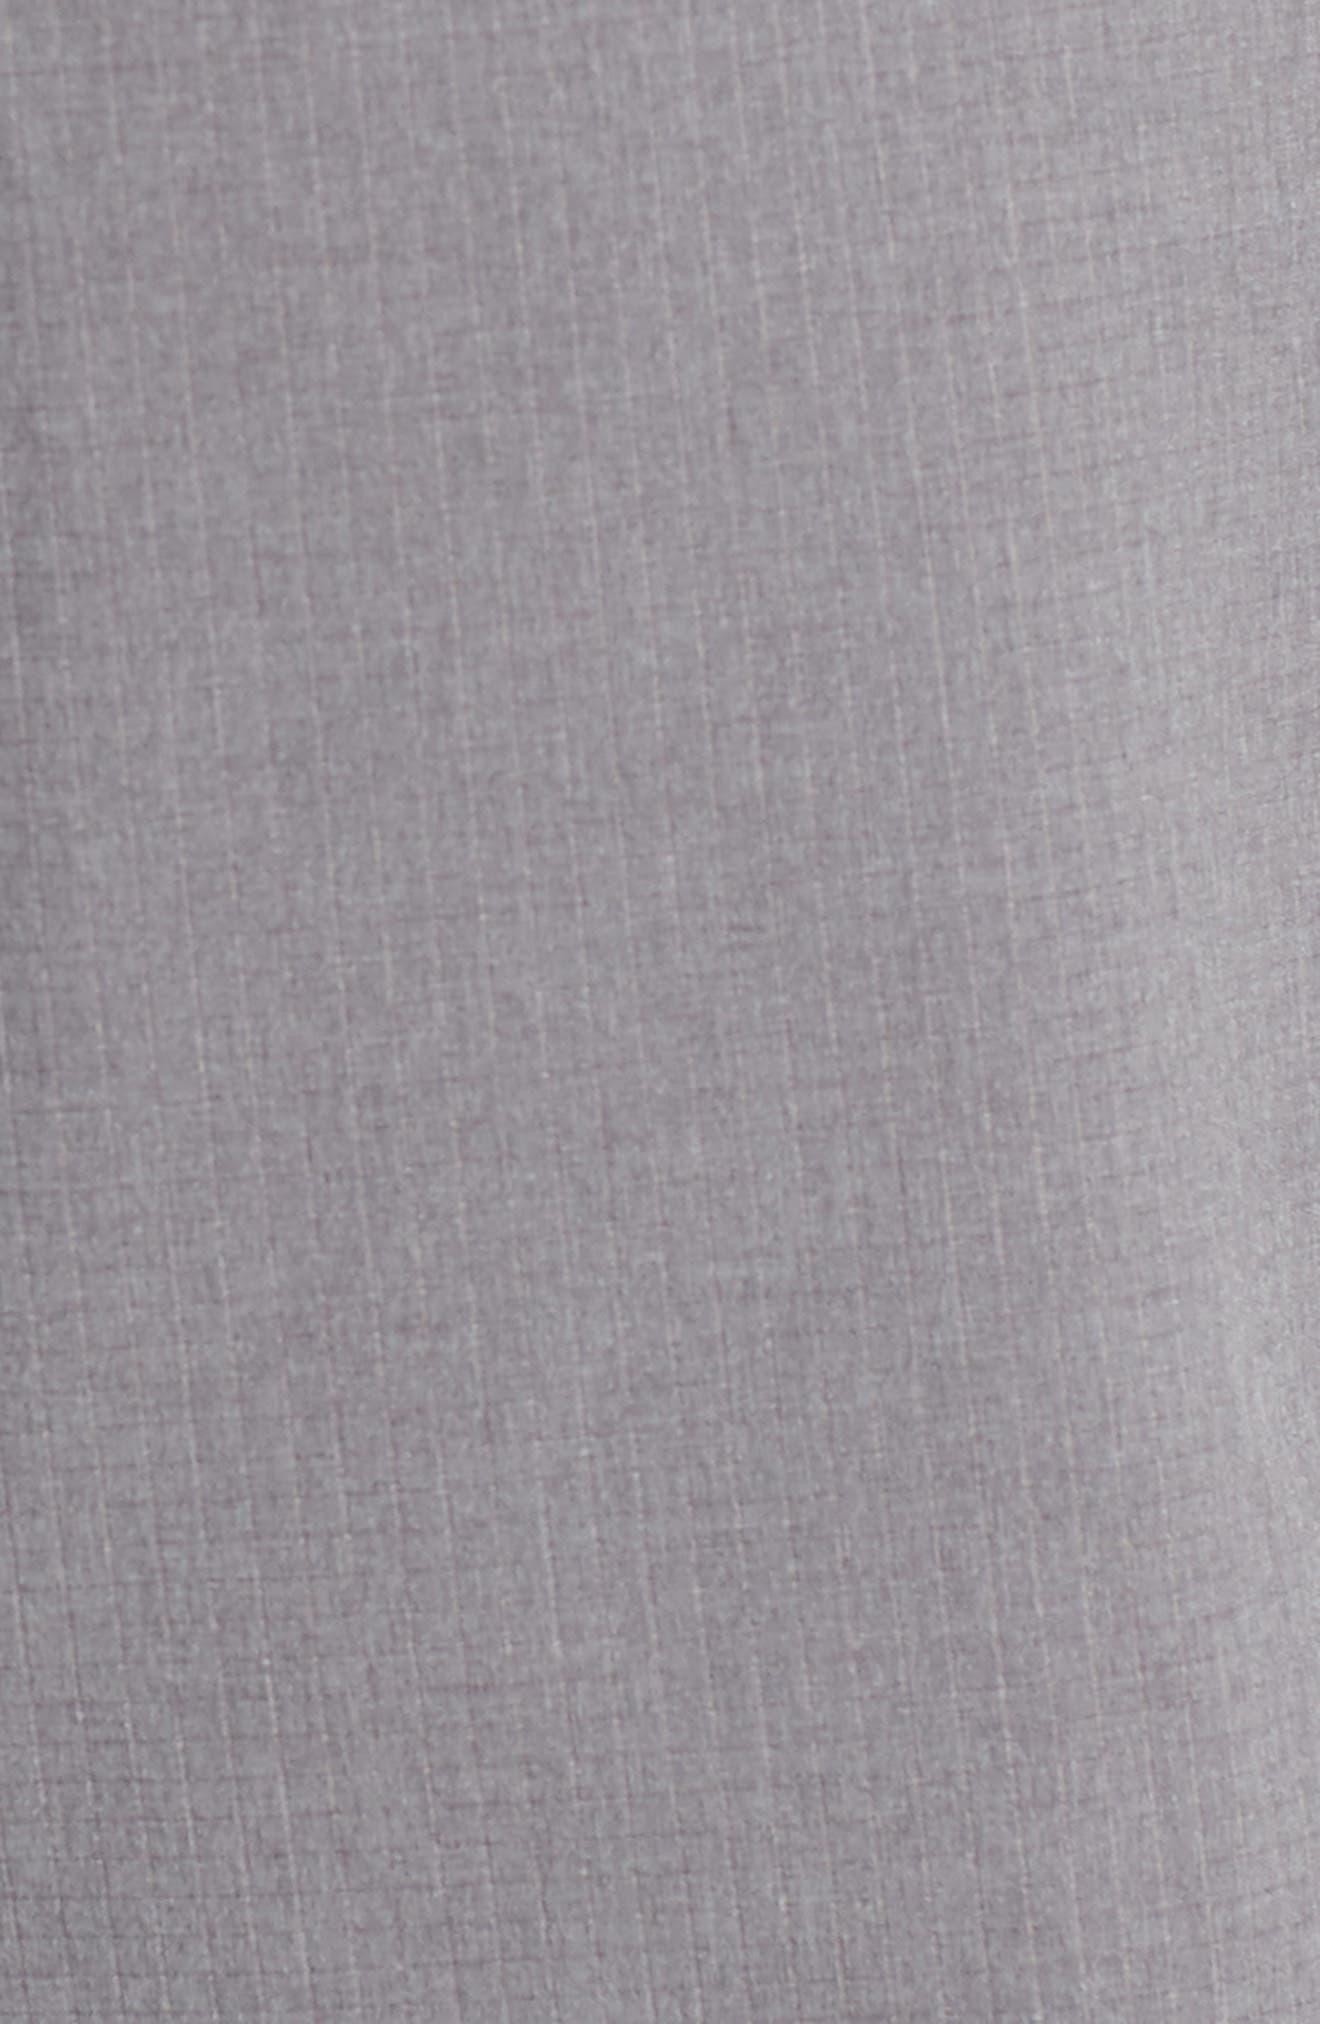 Repel 3.0 Flex Training Shorts,                             Alternate thumbnail 5, color,                             Gun Smoke/ Grey/ Black